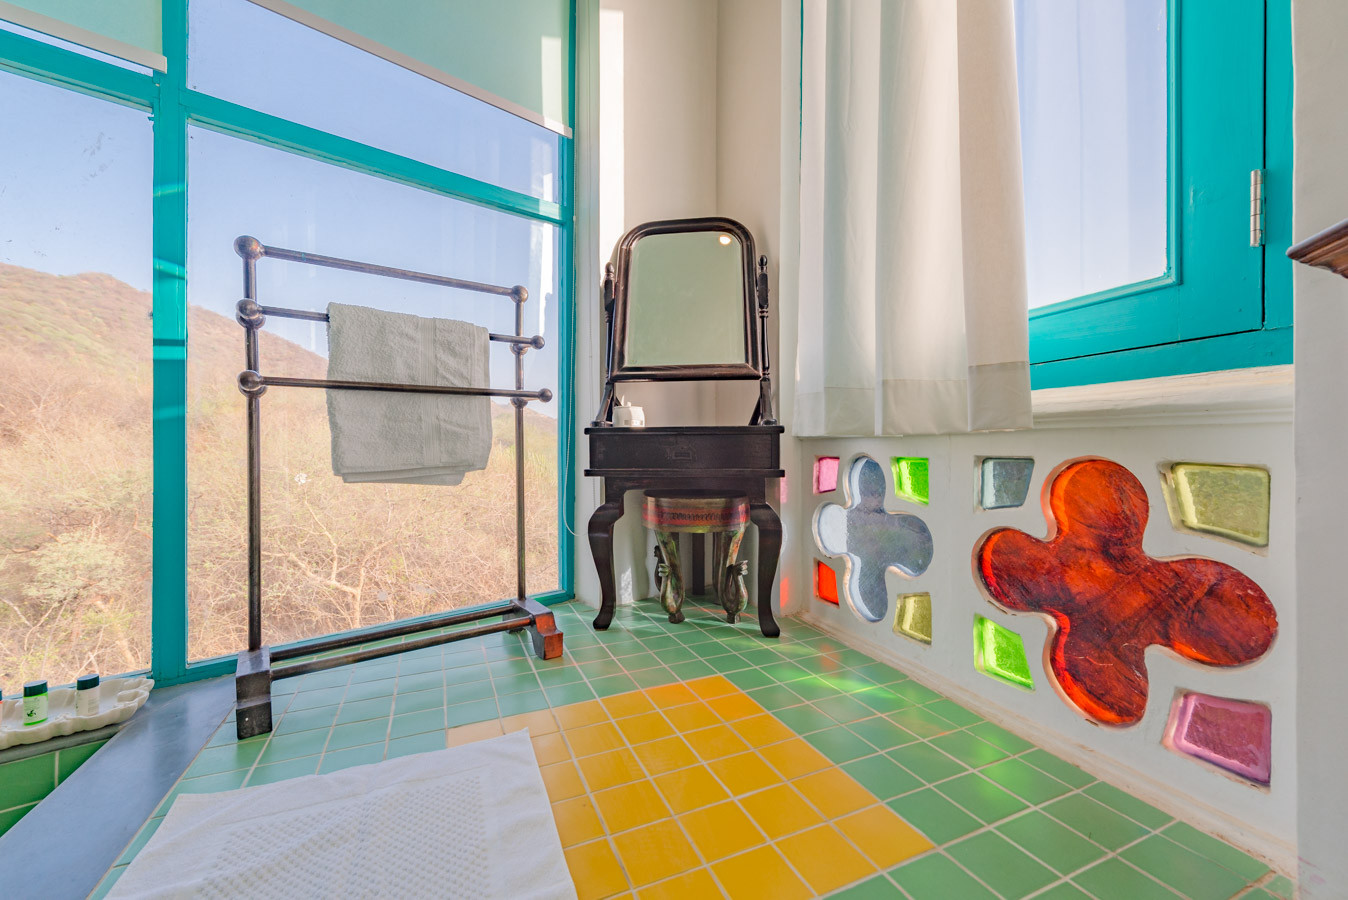 Room-5_Unbound_Jungalow_12.jpg